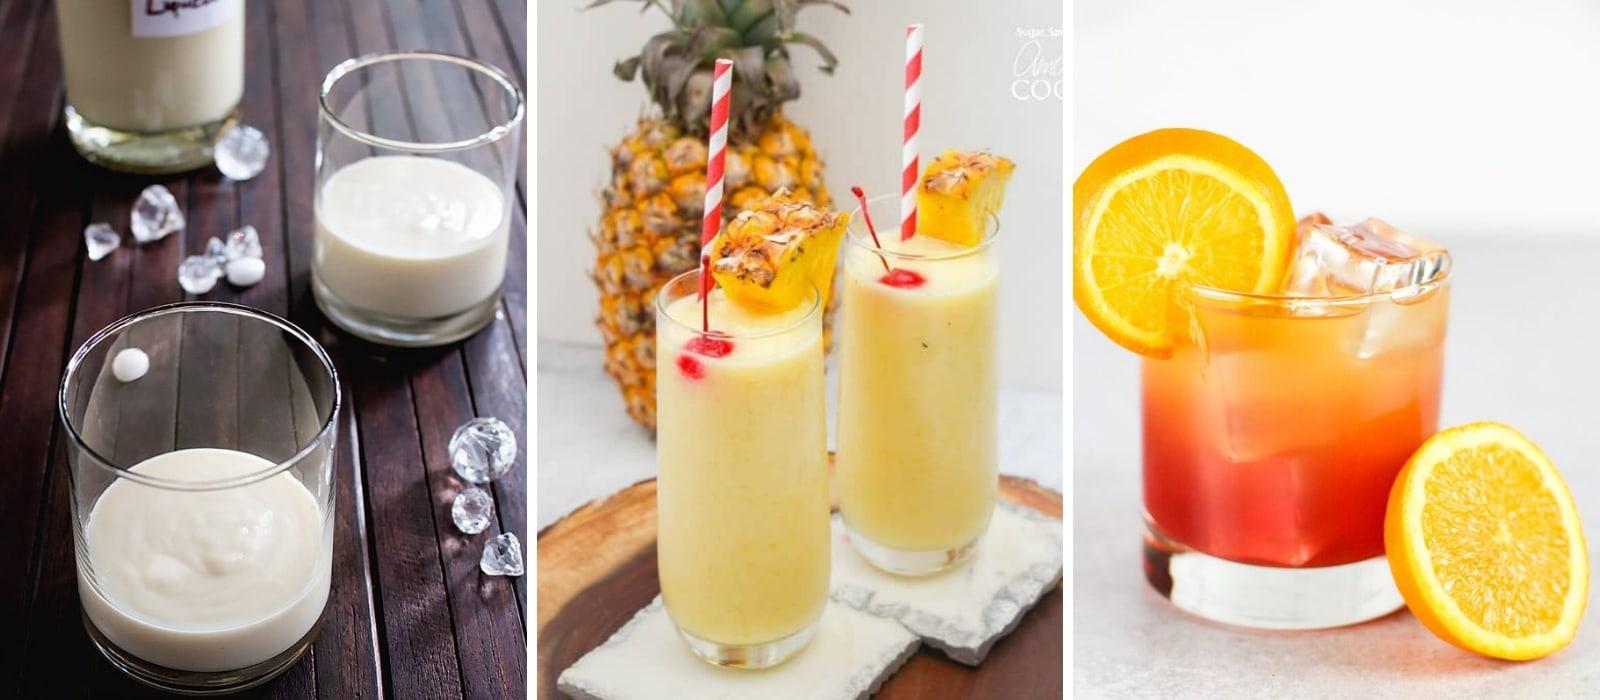 Marvelous Malibu Rum Cocktails| The Best Rum Cocktails| Malibu Rum Drinks Recipes| Easy Malibu Rum Drinks| Easy Malibu Rum Recipes| Rum Cocktails for a Crowd| #recipes #rum #rumcocktails #cocktails #maliburum #dairyfree